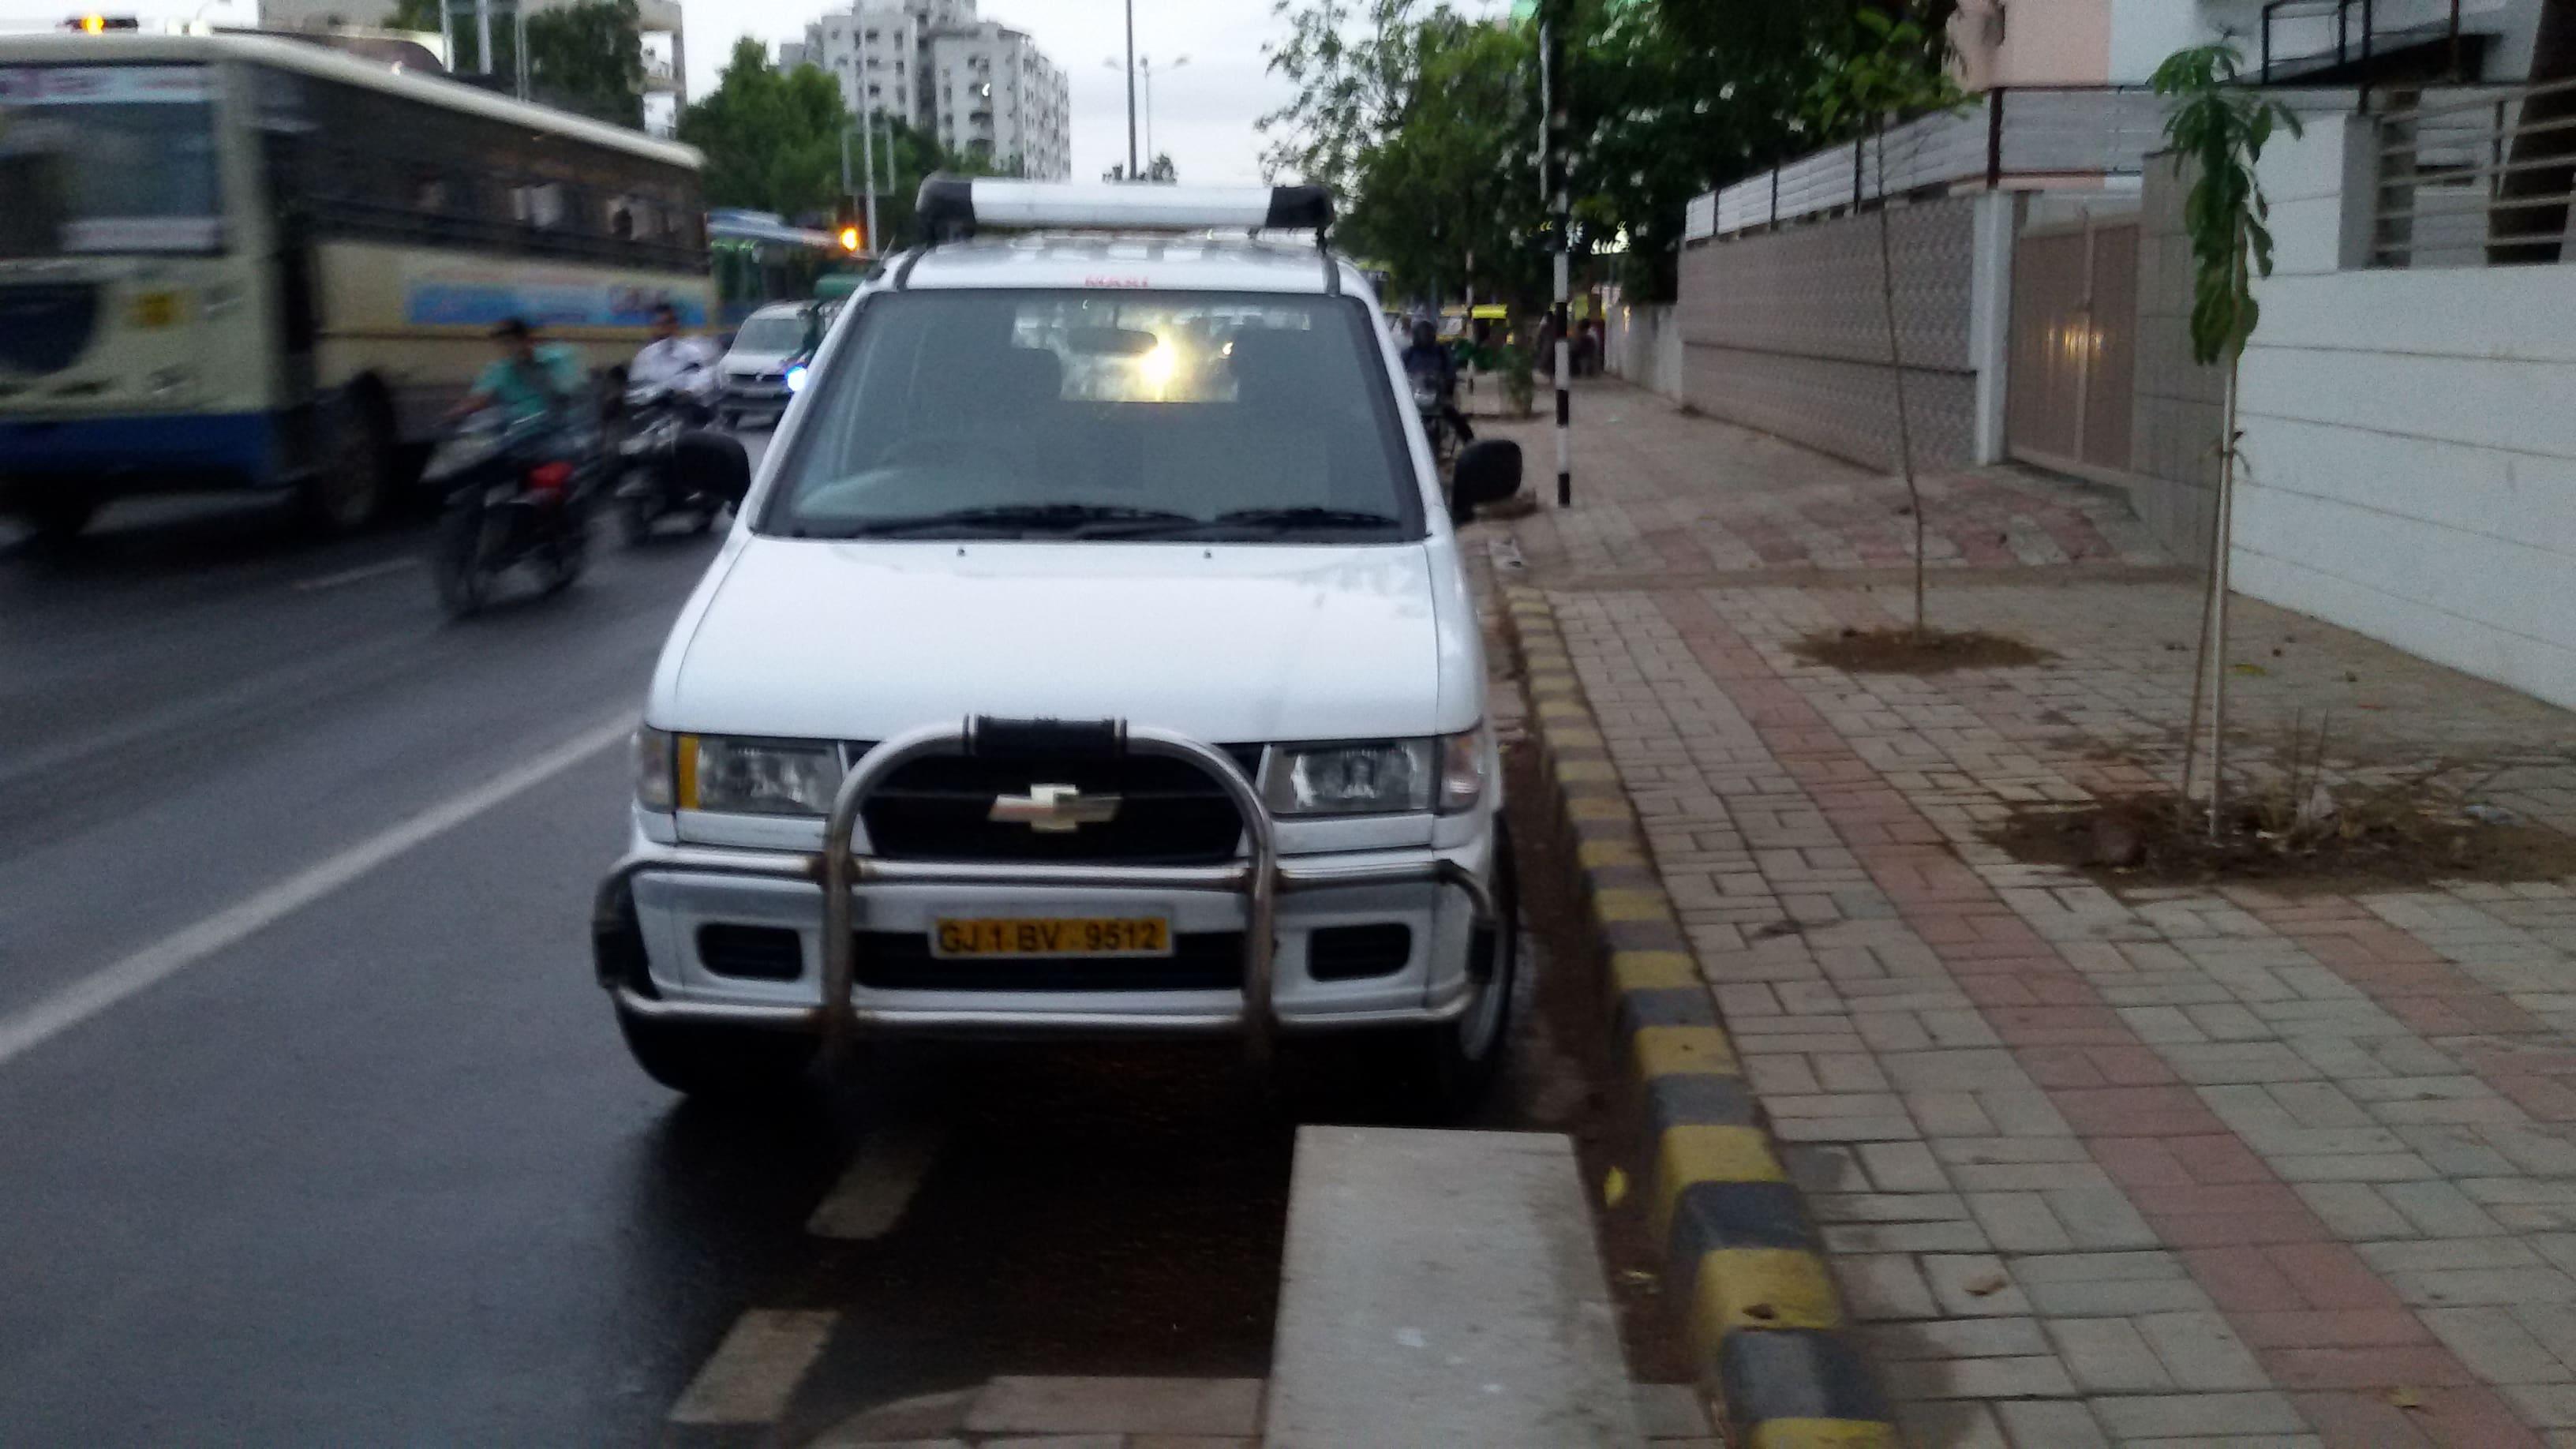 Used Chevrolet Tavera 2003-2007 B2-10 seats BSIII (Id-896872) Car in Ahmedabad